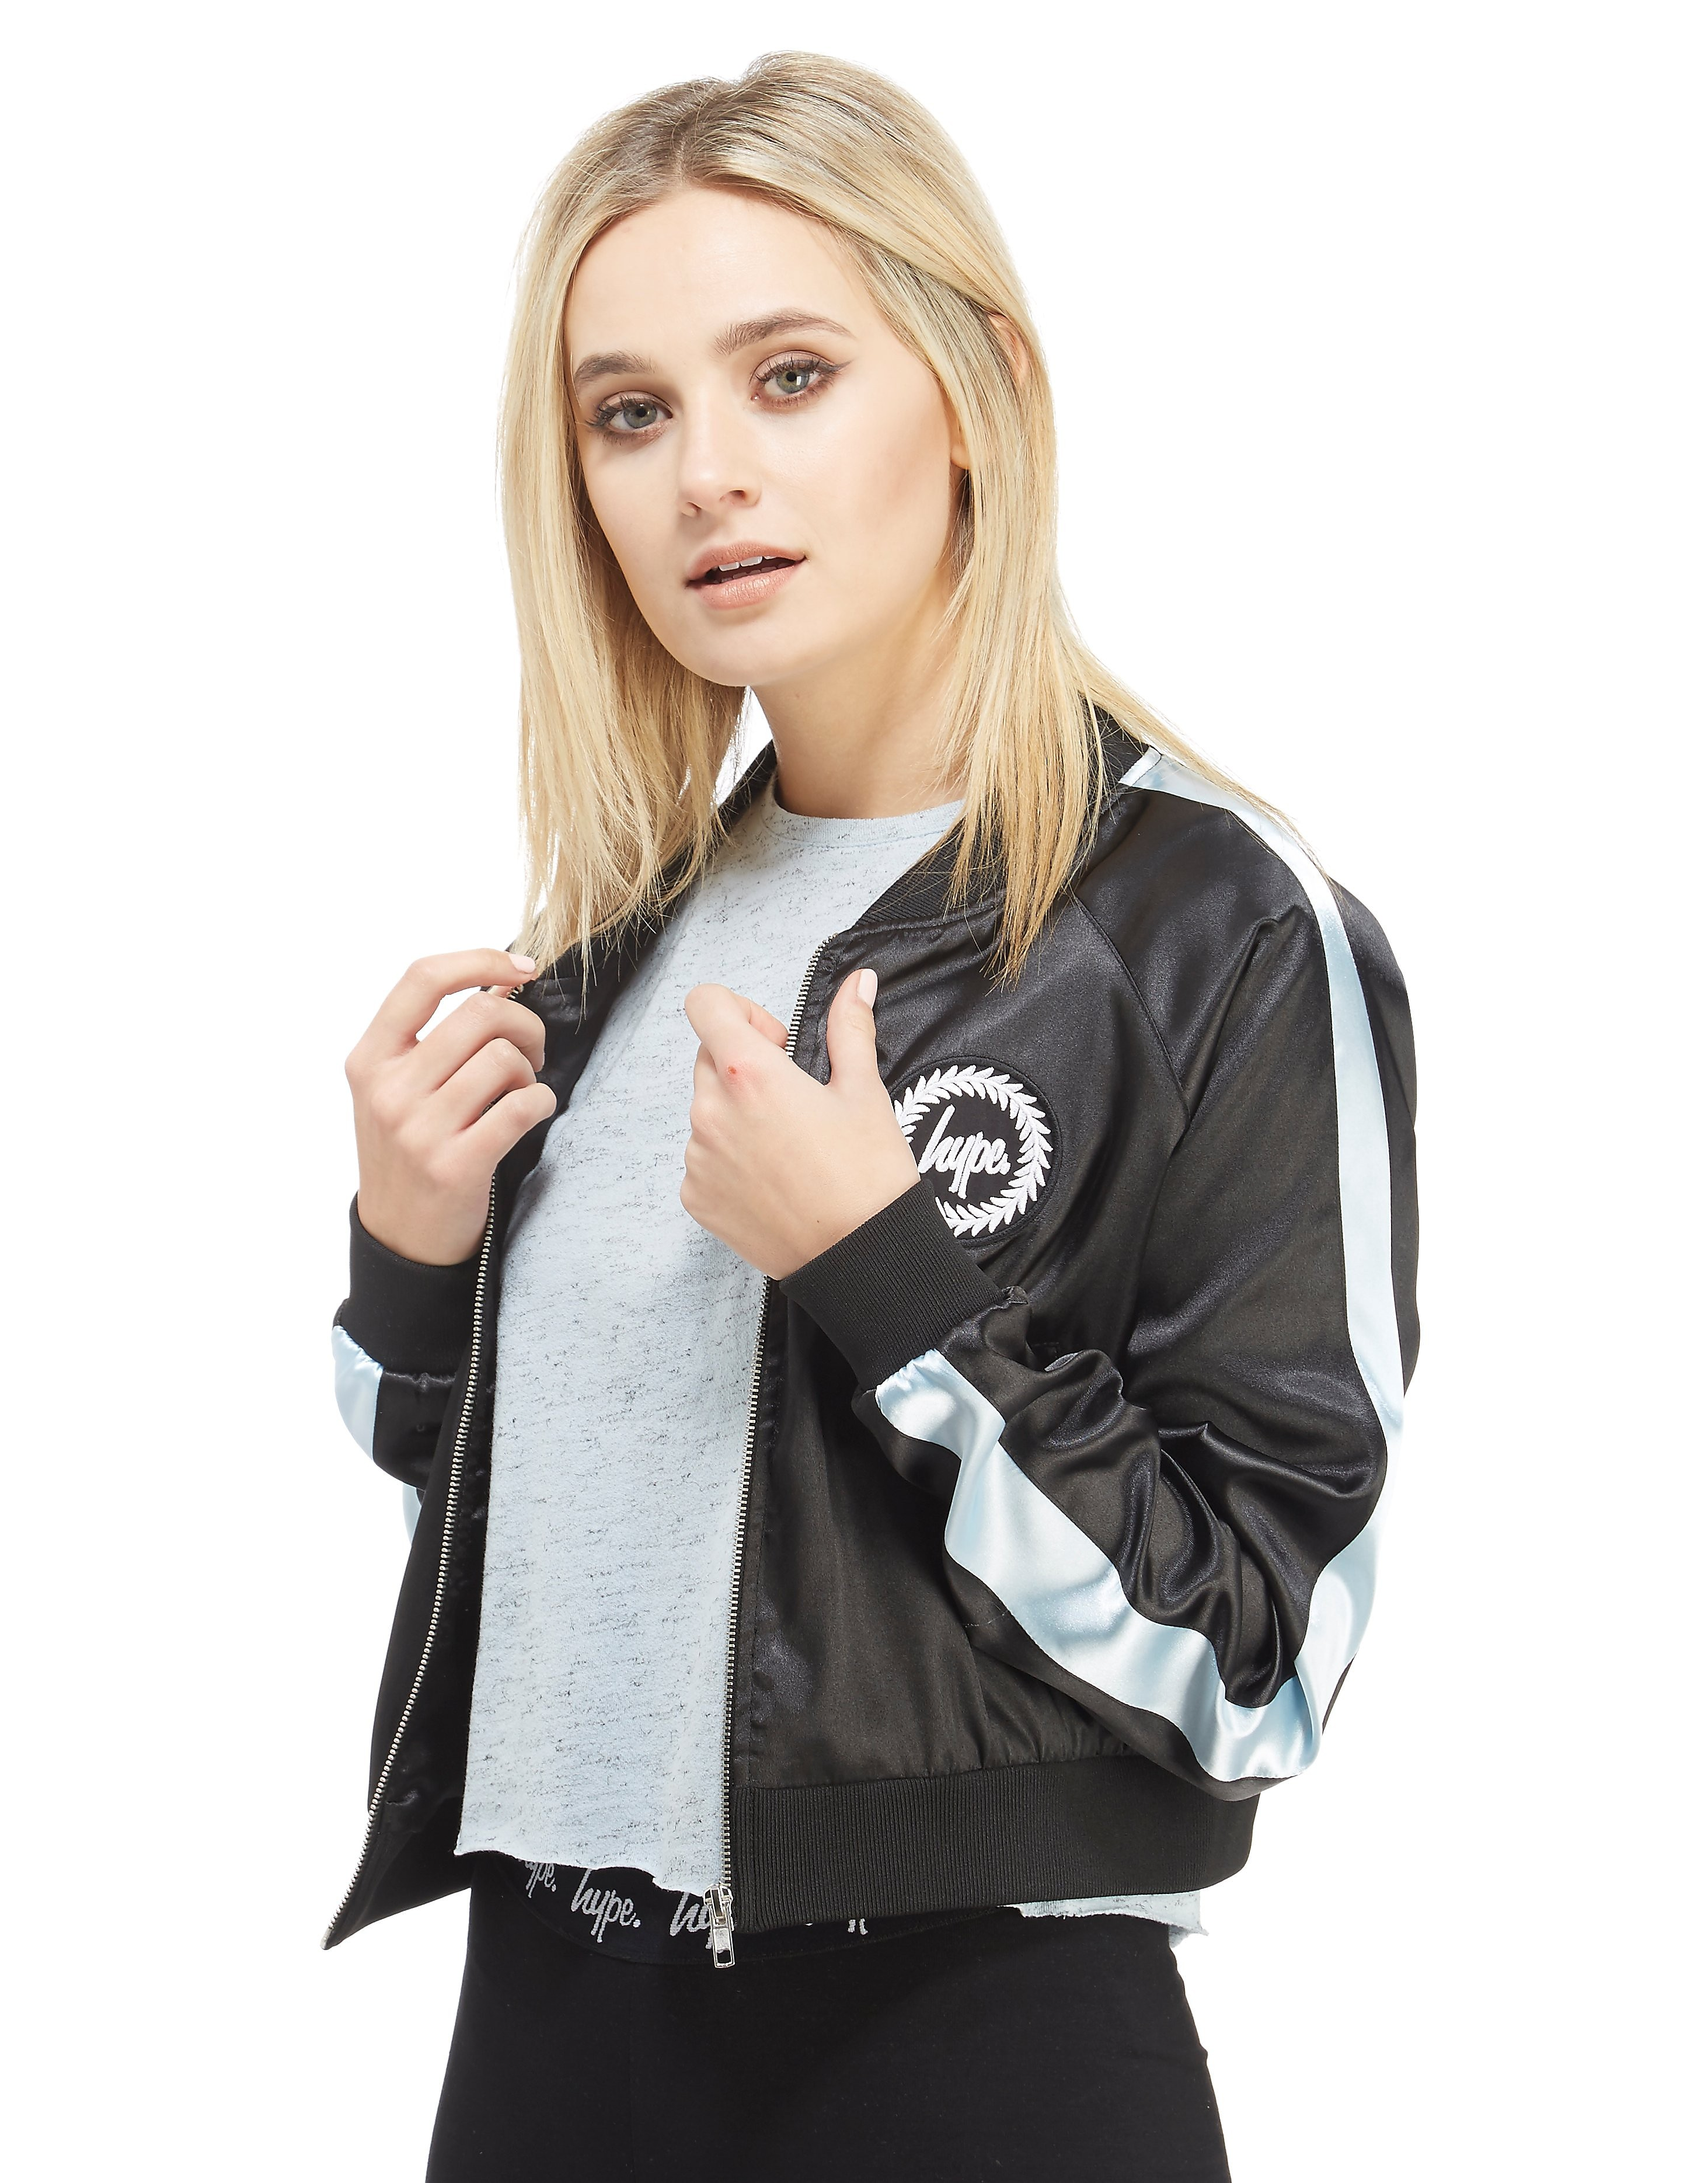 Hype Crop Souvenir Jacket